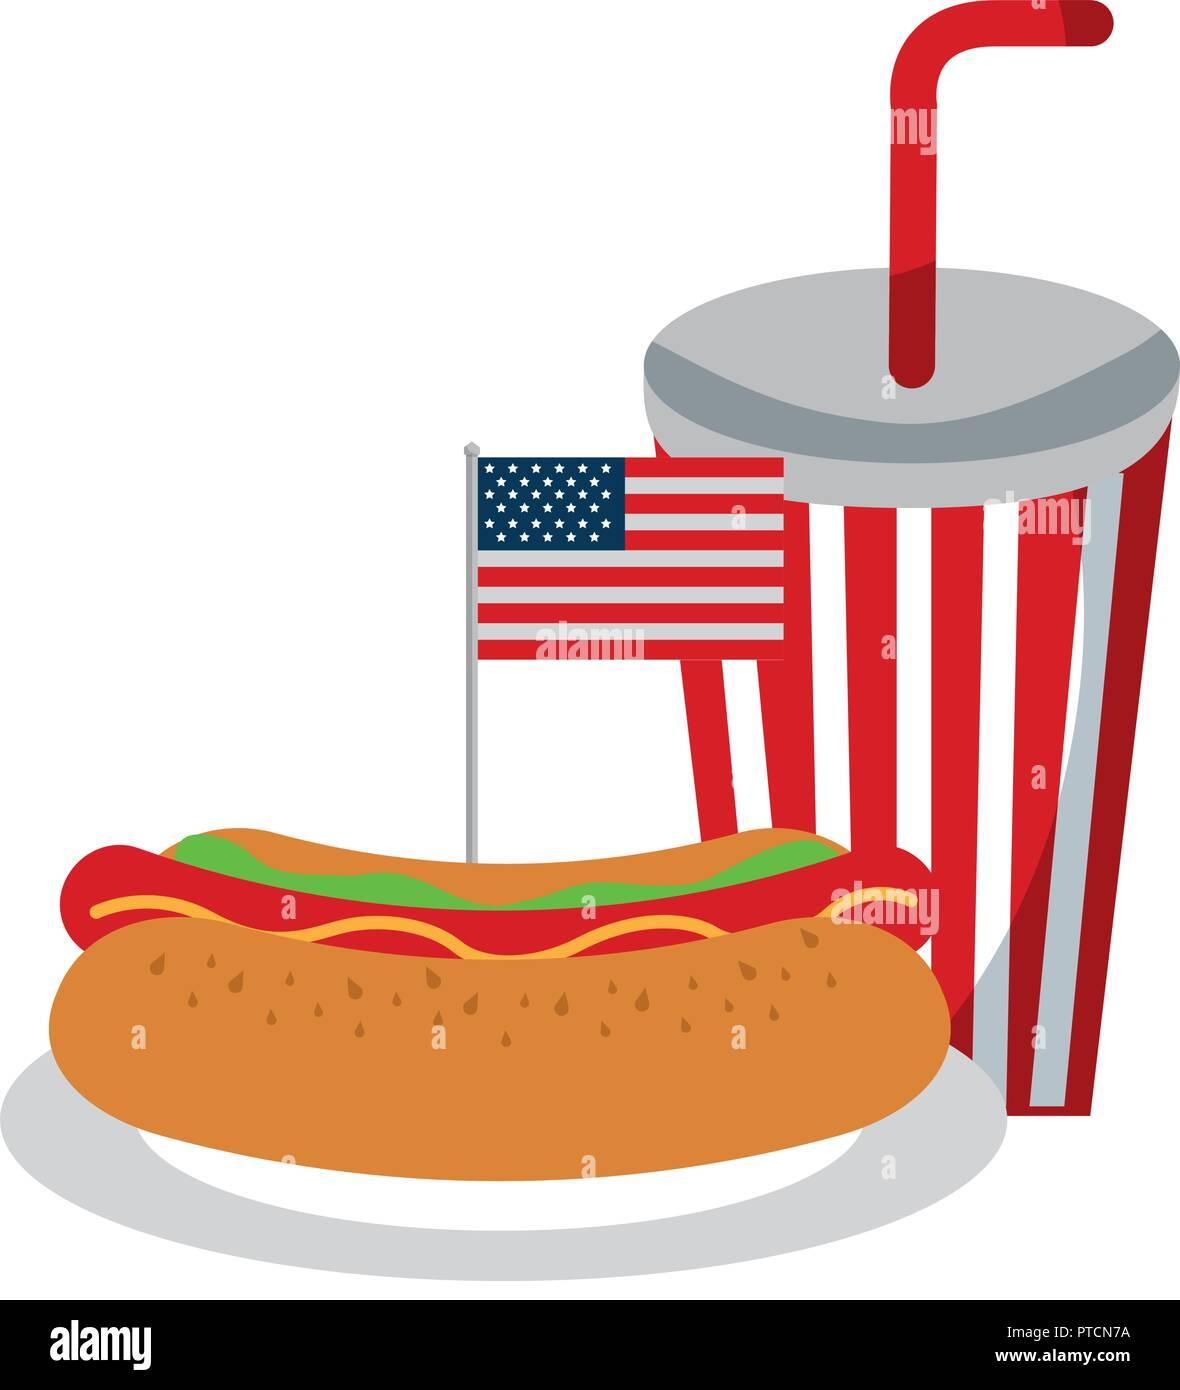 518a453d8e9a hot dog soda flag american food celebration vector illustration ...